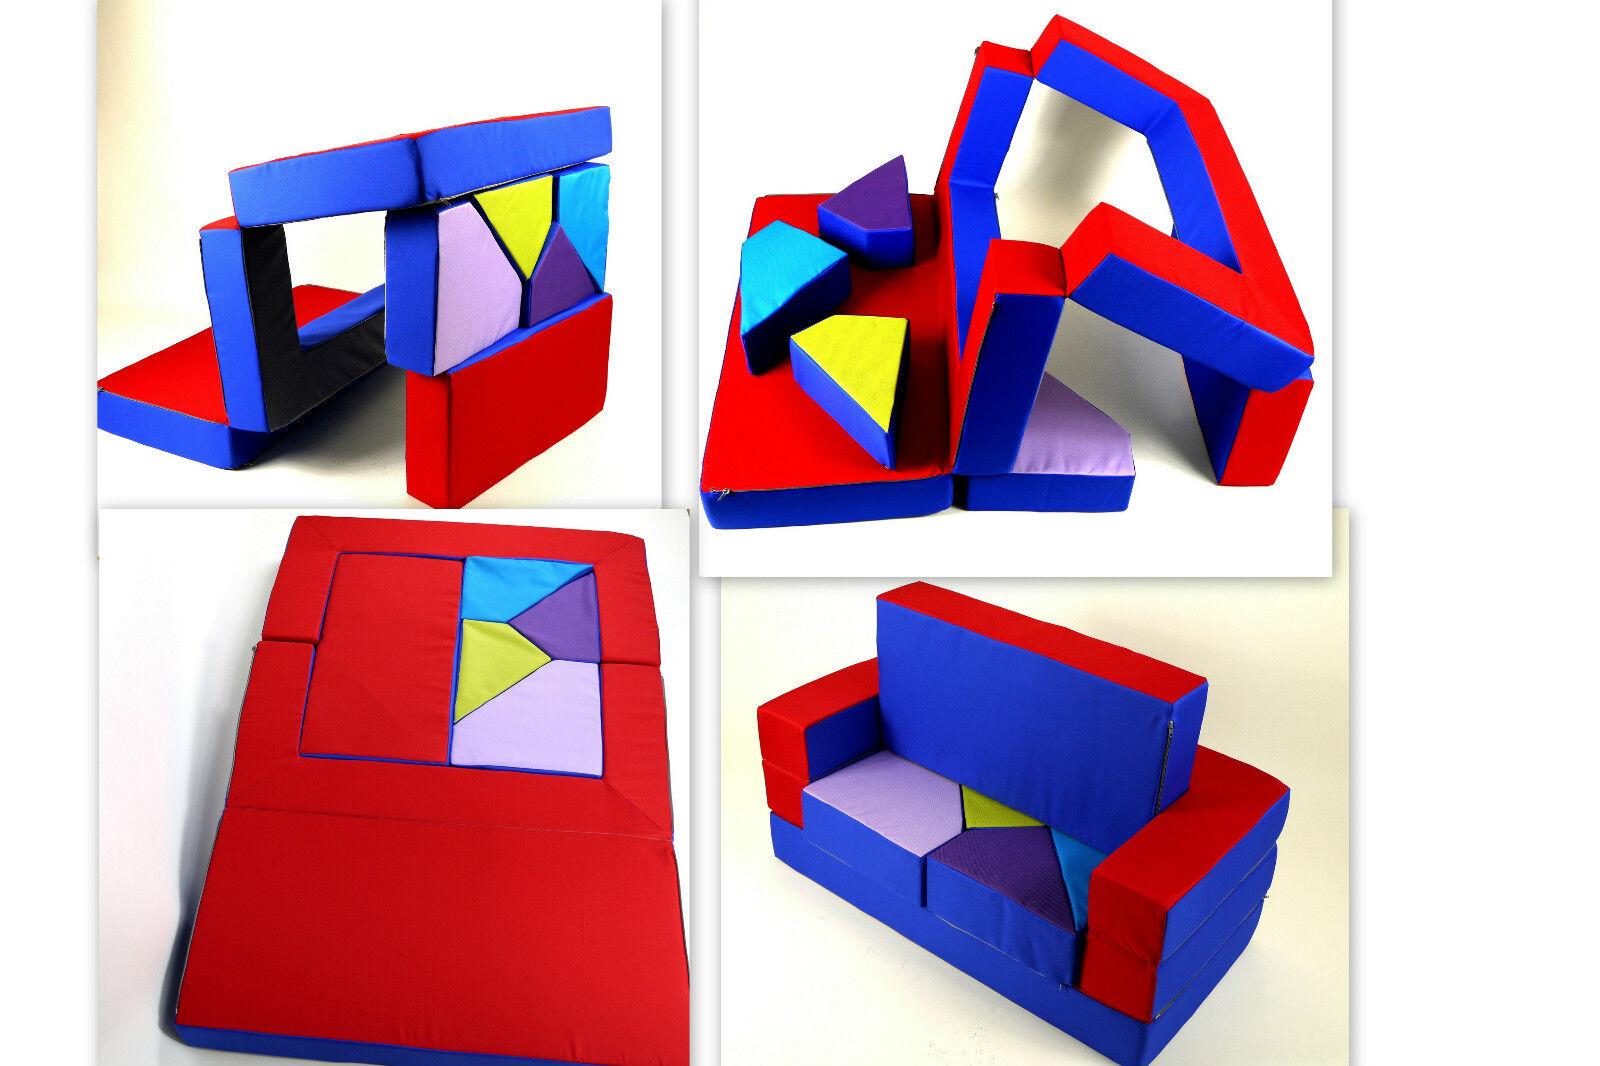 Kg02b spielsofa 4in1 spielmatraze Kindersofa Puzzle kinderzimmersofa softsofa